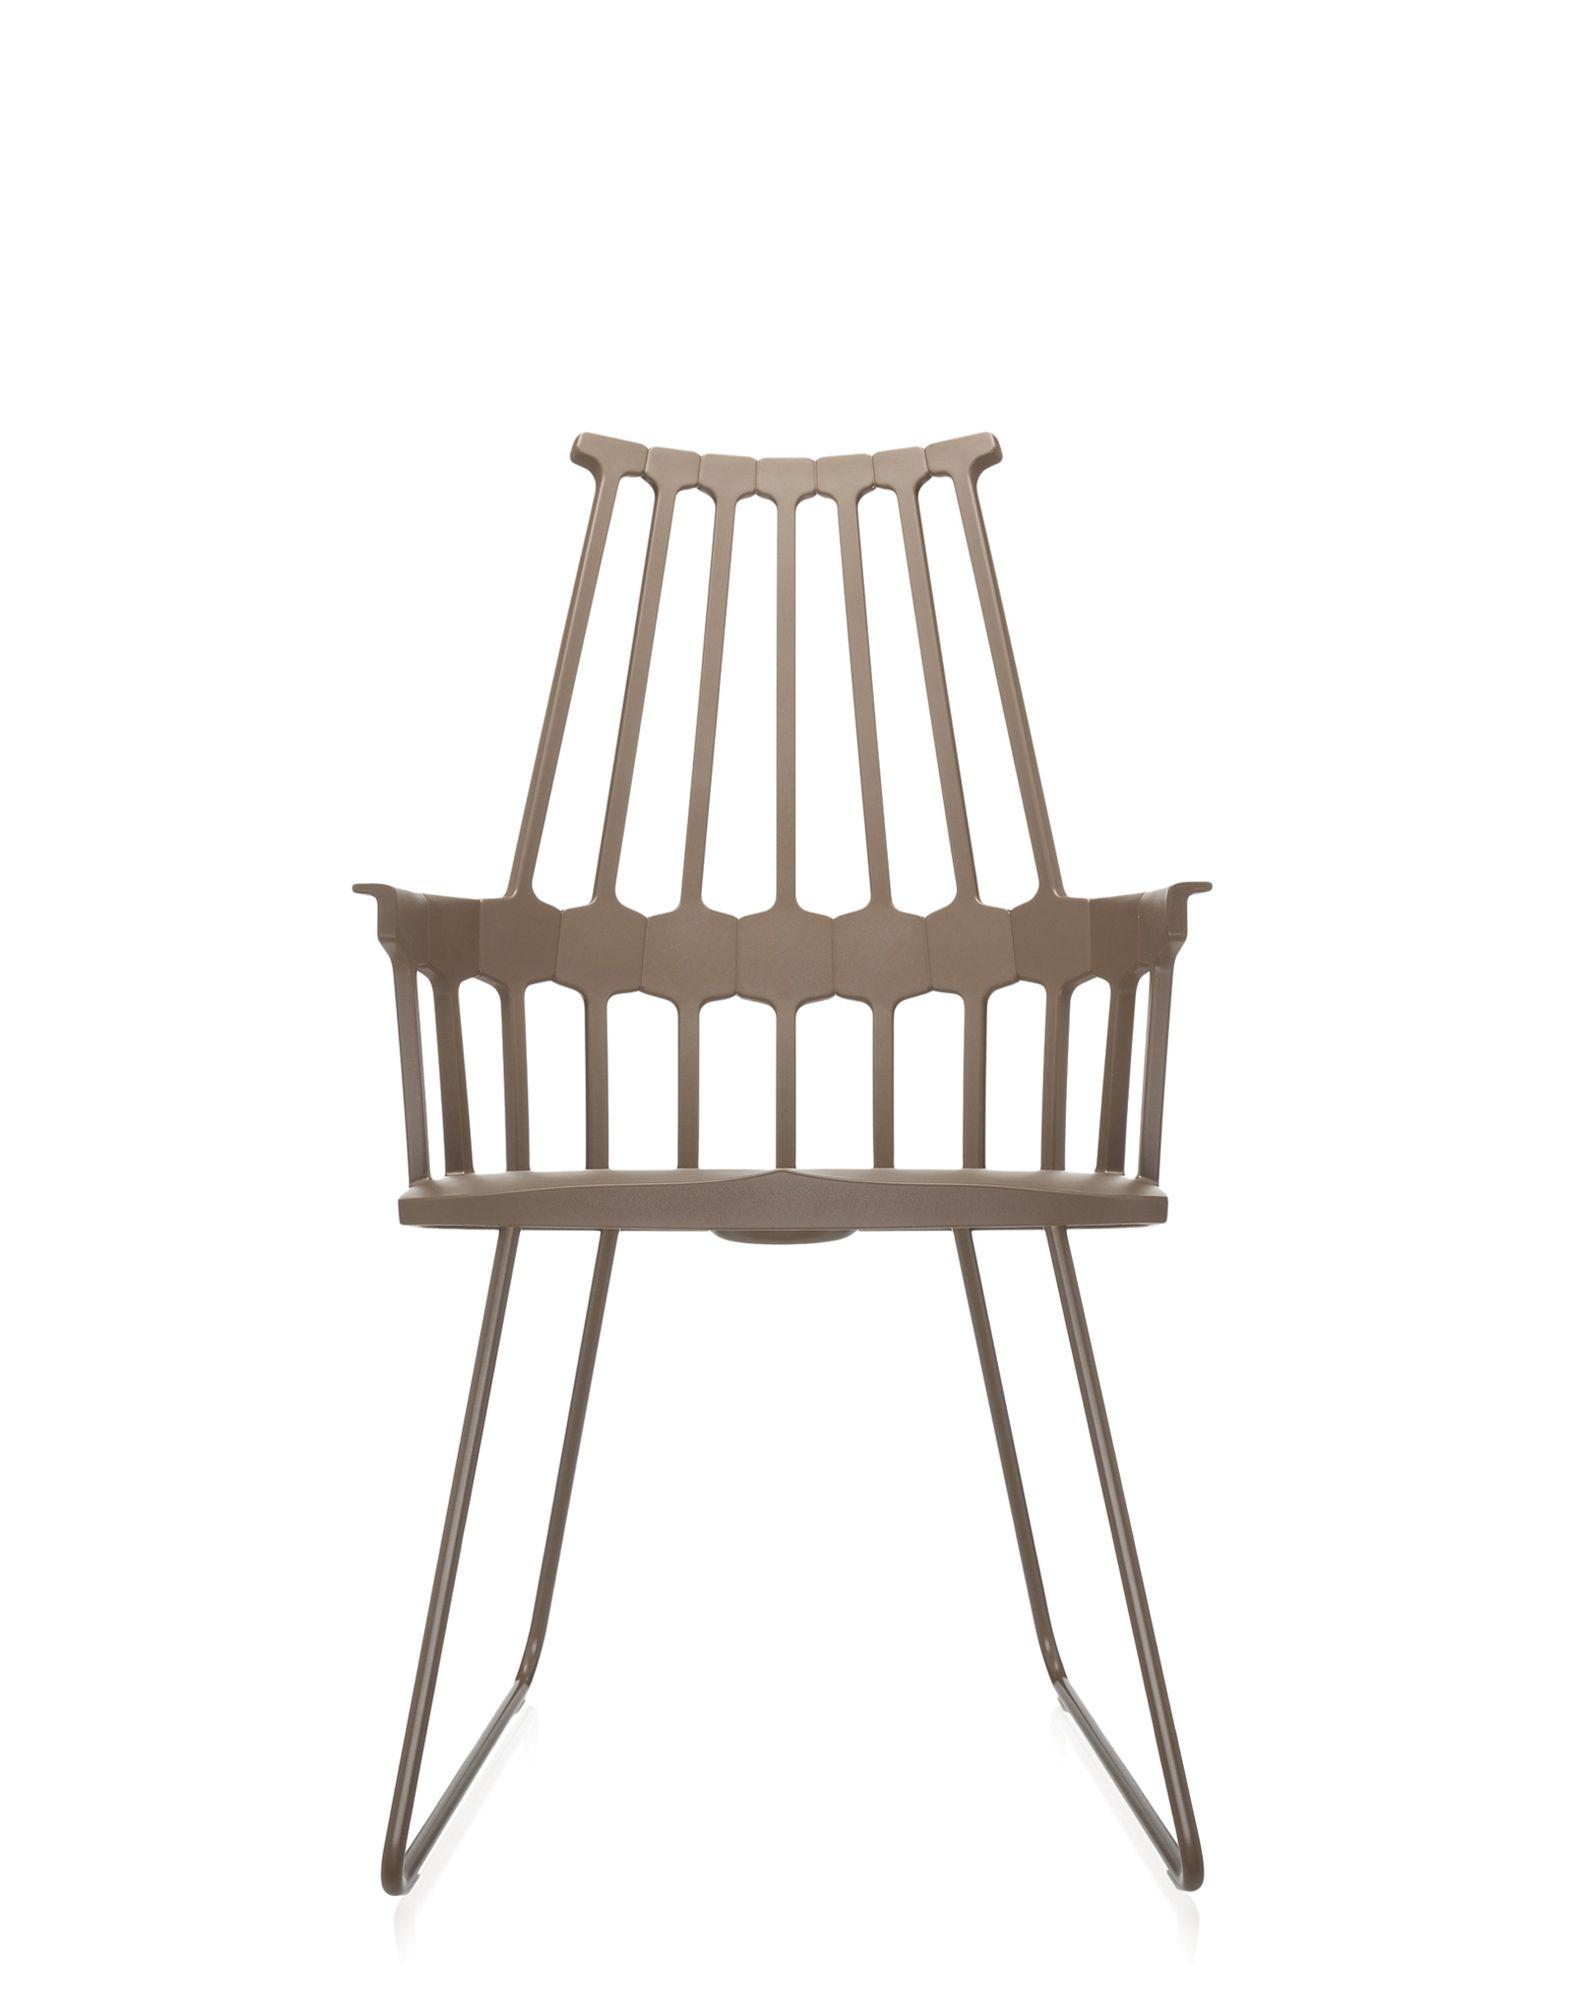 Kartell comback nocciola sedie design newformsdesign for Sedie plastica design kartell